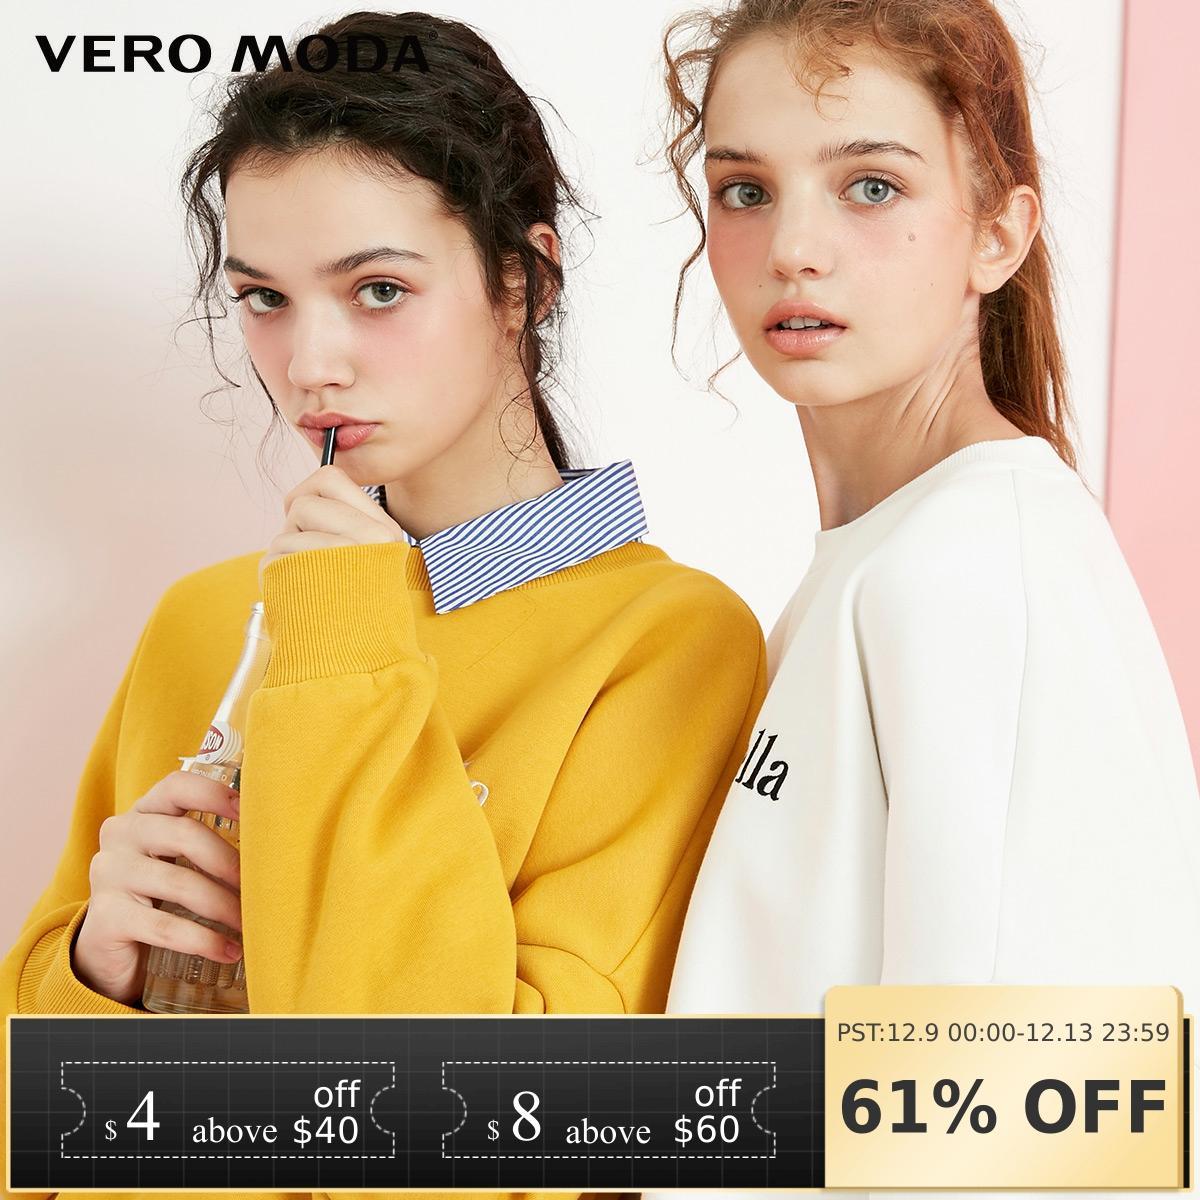 Vero Moda Women's 2019  Ins Style Round Neck Drop Shoulder Leisure Loose Sweatshirt Hoodie | 318433511